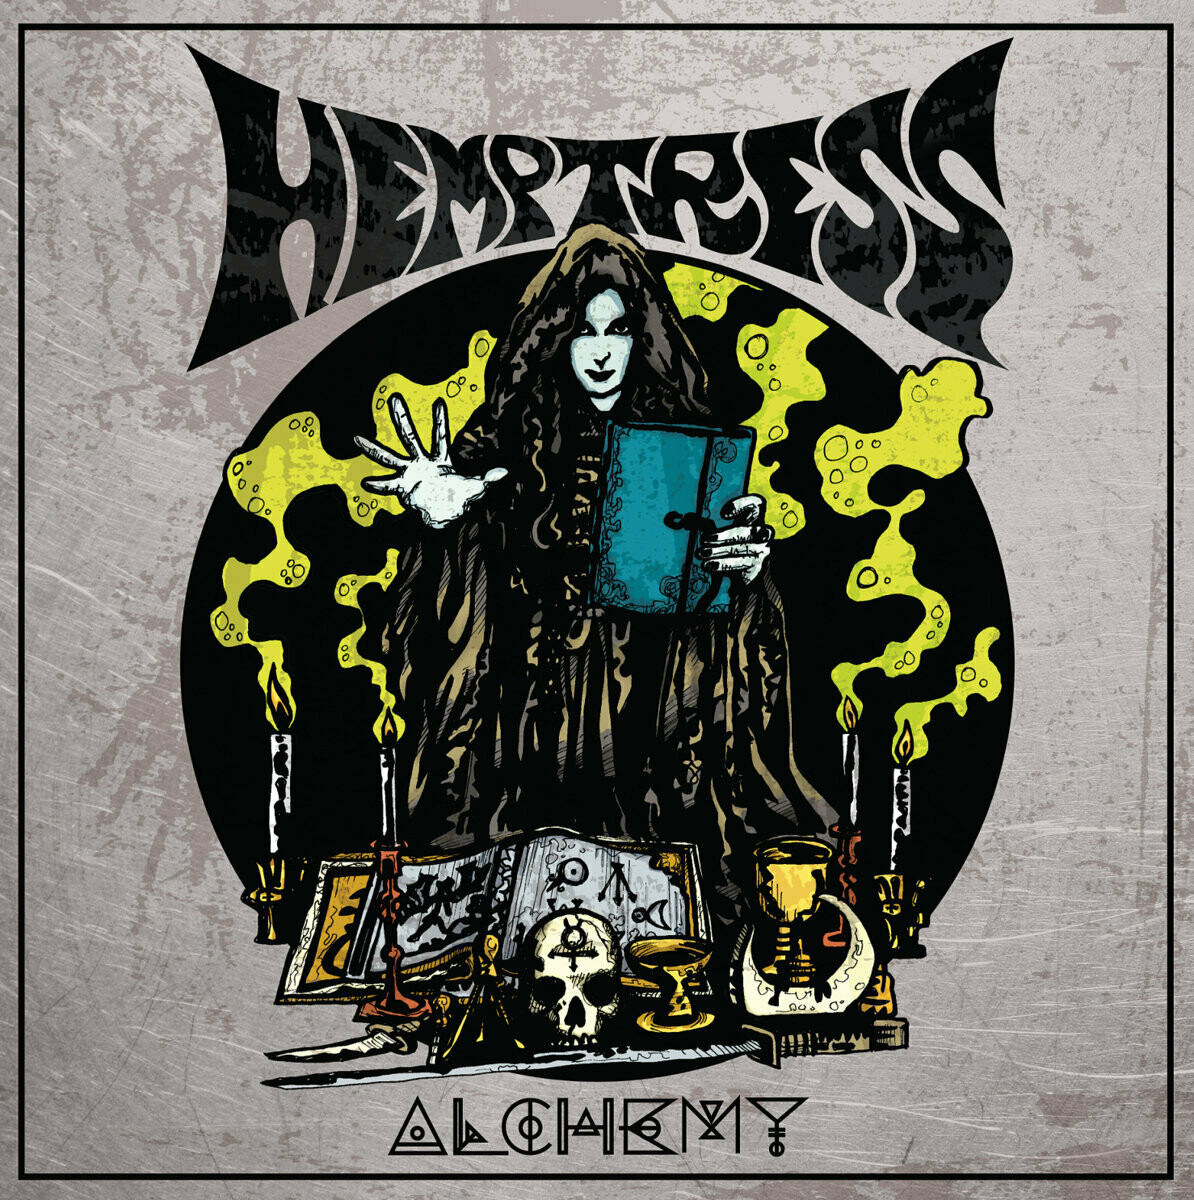 Hemptress - Alchemy - LP